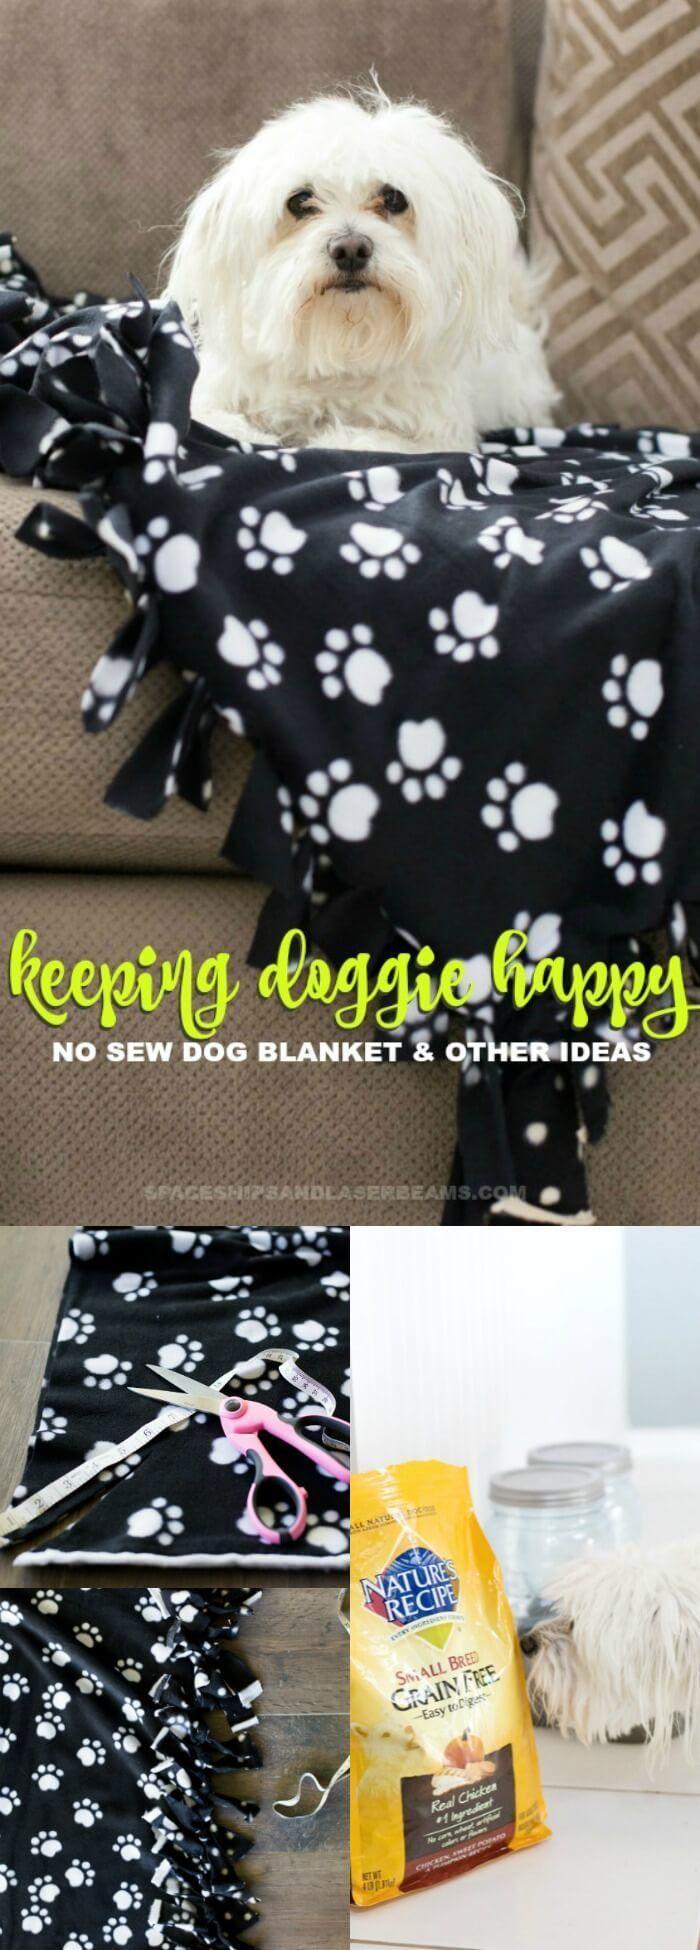 Keeping Doggie Happy: No Sew Blanket + More Ideas via @spaceshipslb